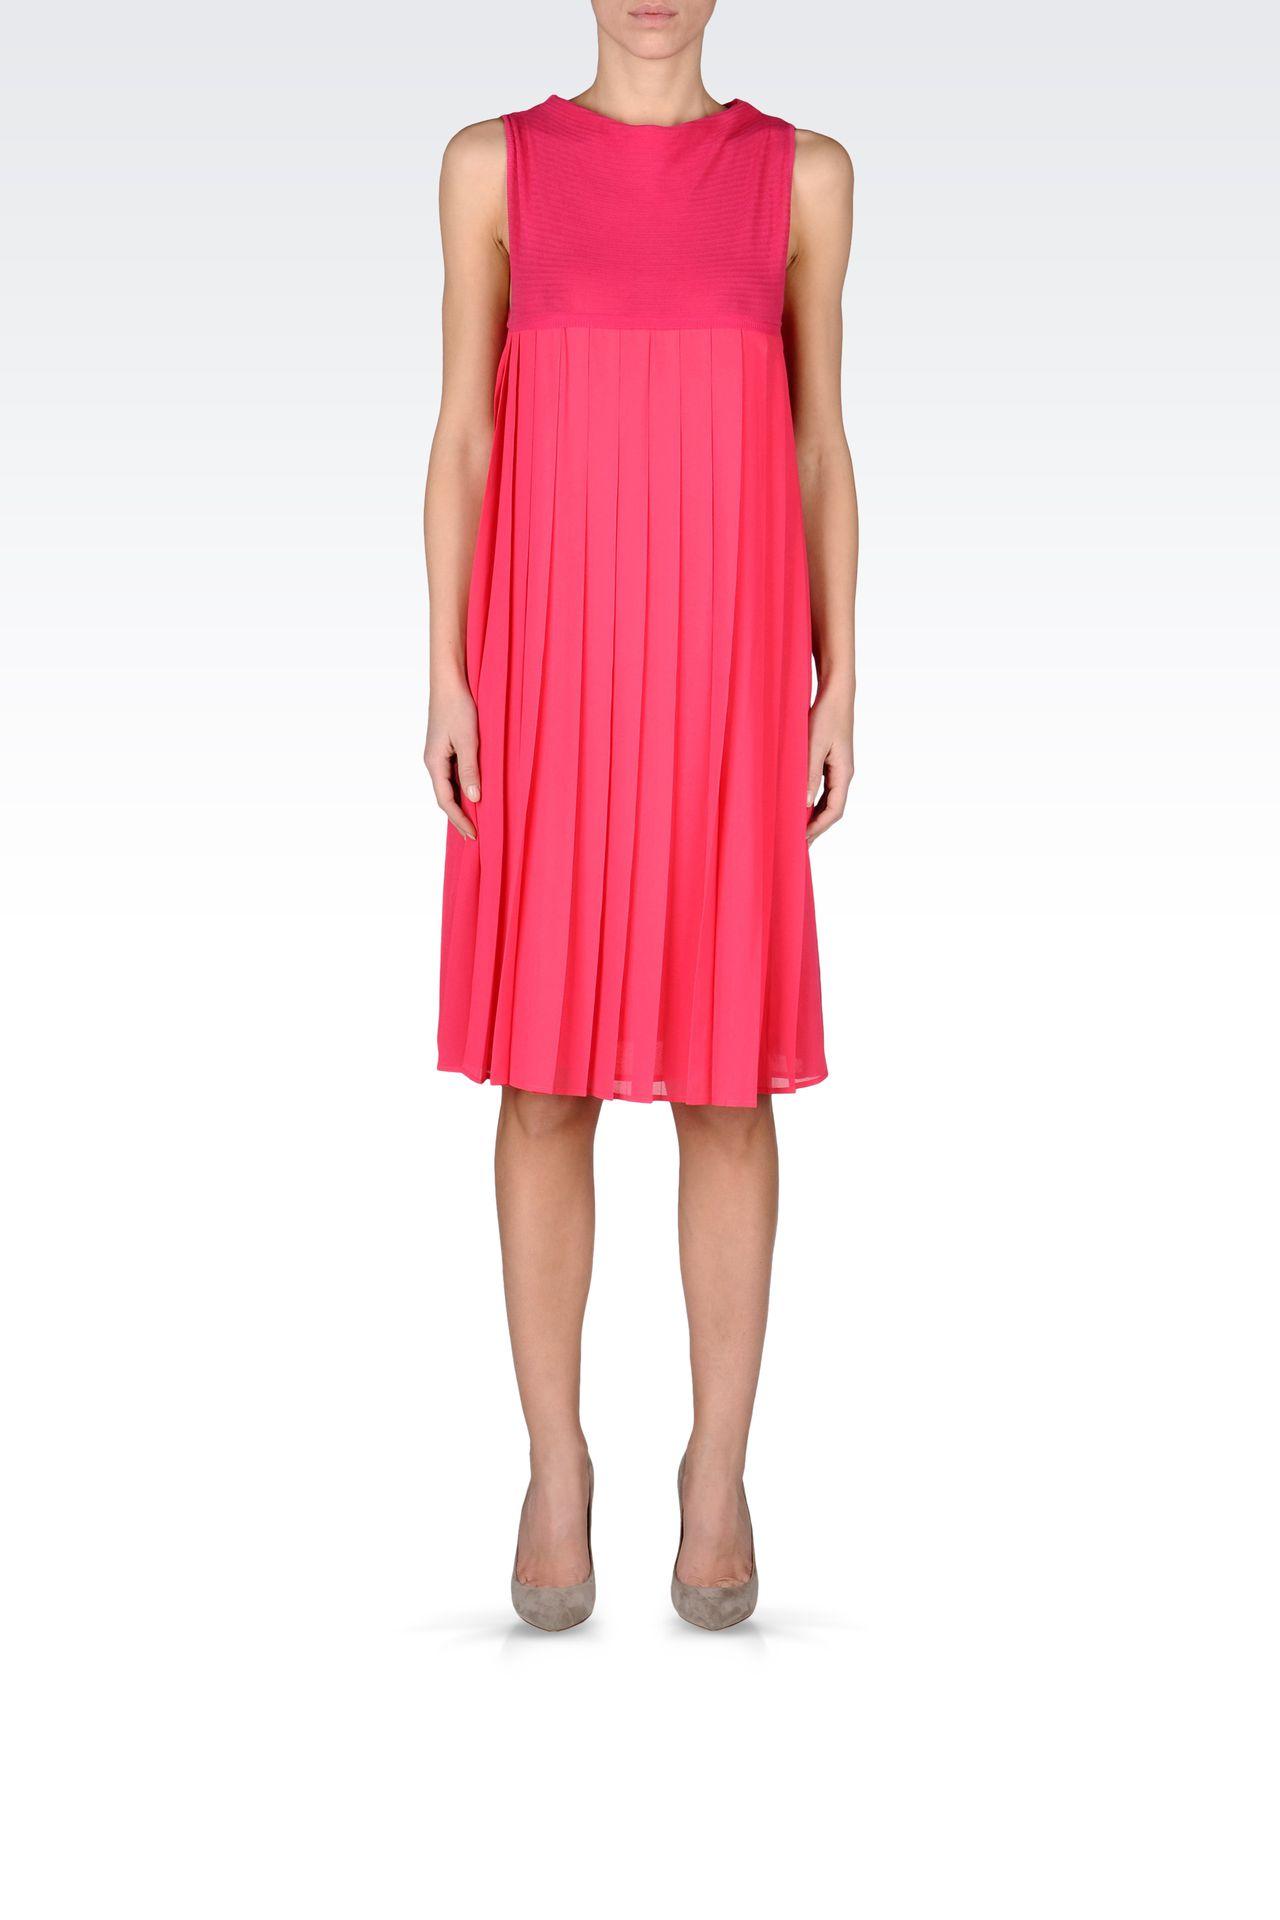 PLEATED DRESS IN CHEVRON COTTON: Short Dresses Women by Armani - 0